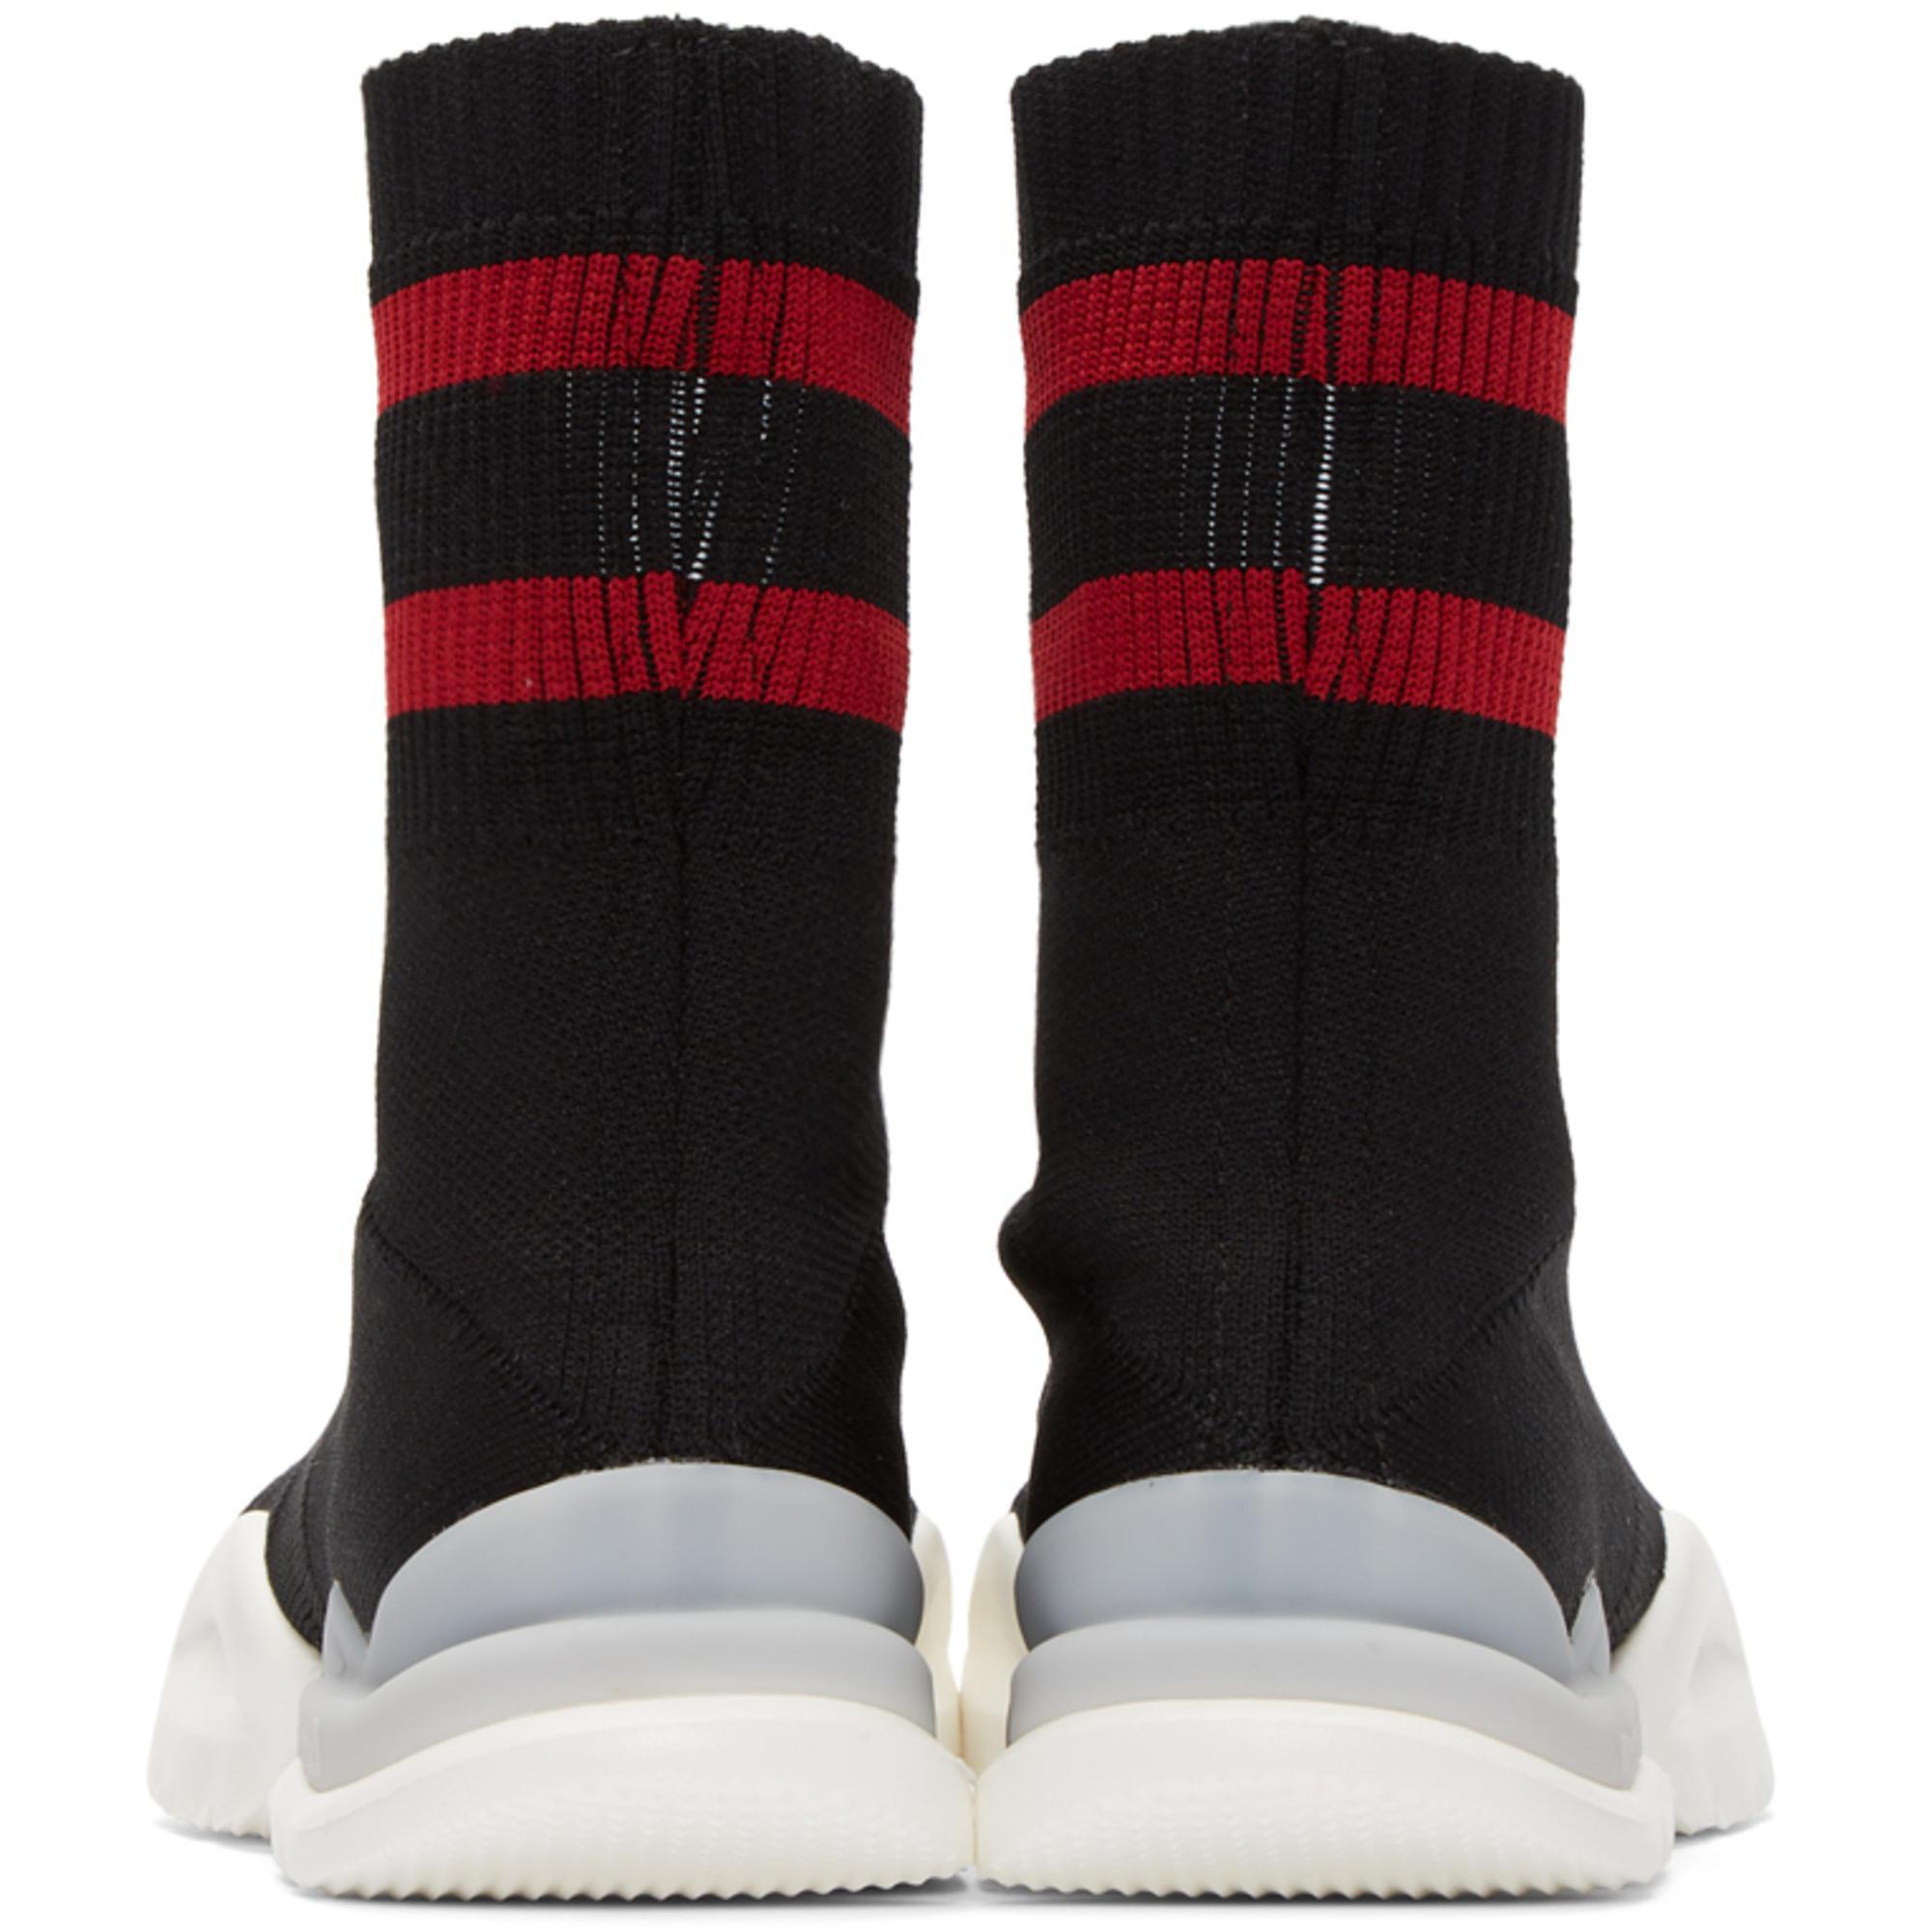 Wide Range Of For Sale Outlet Newest Black Reebok Edition Sock Pump High-Top Sneakers VETEMENTS nIRSL